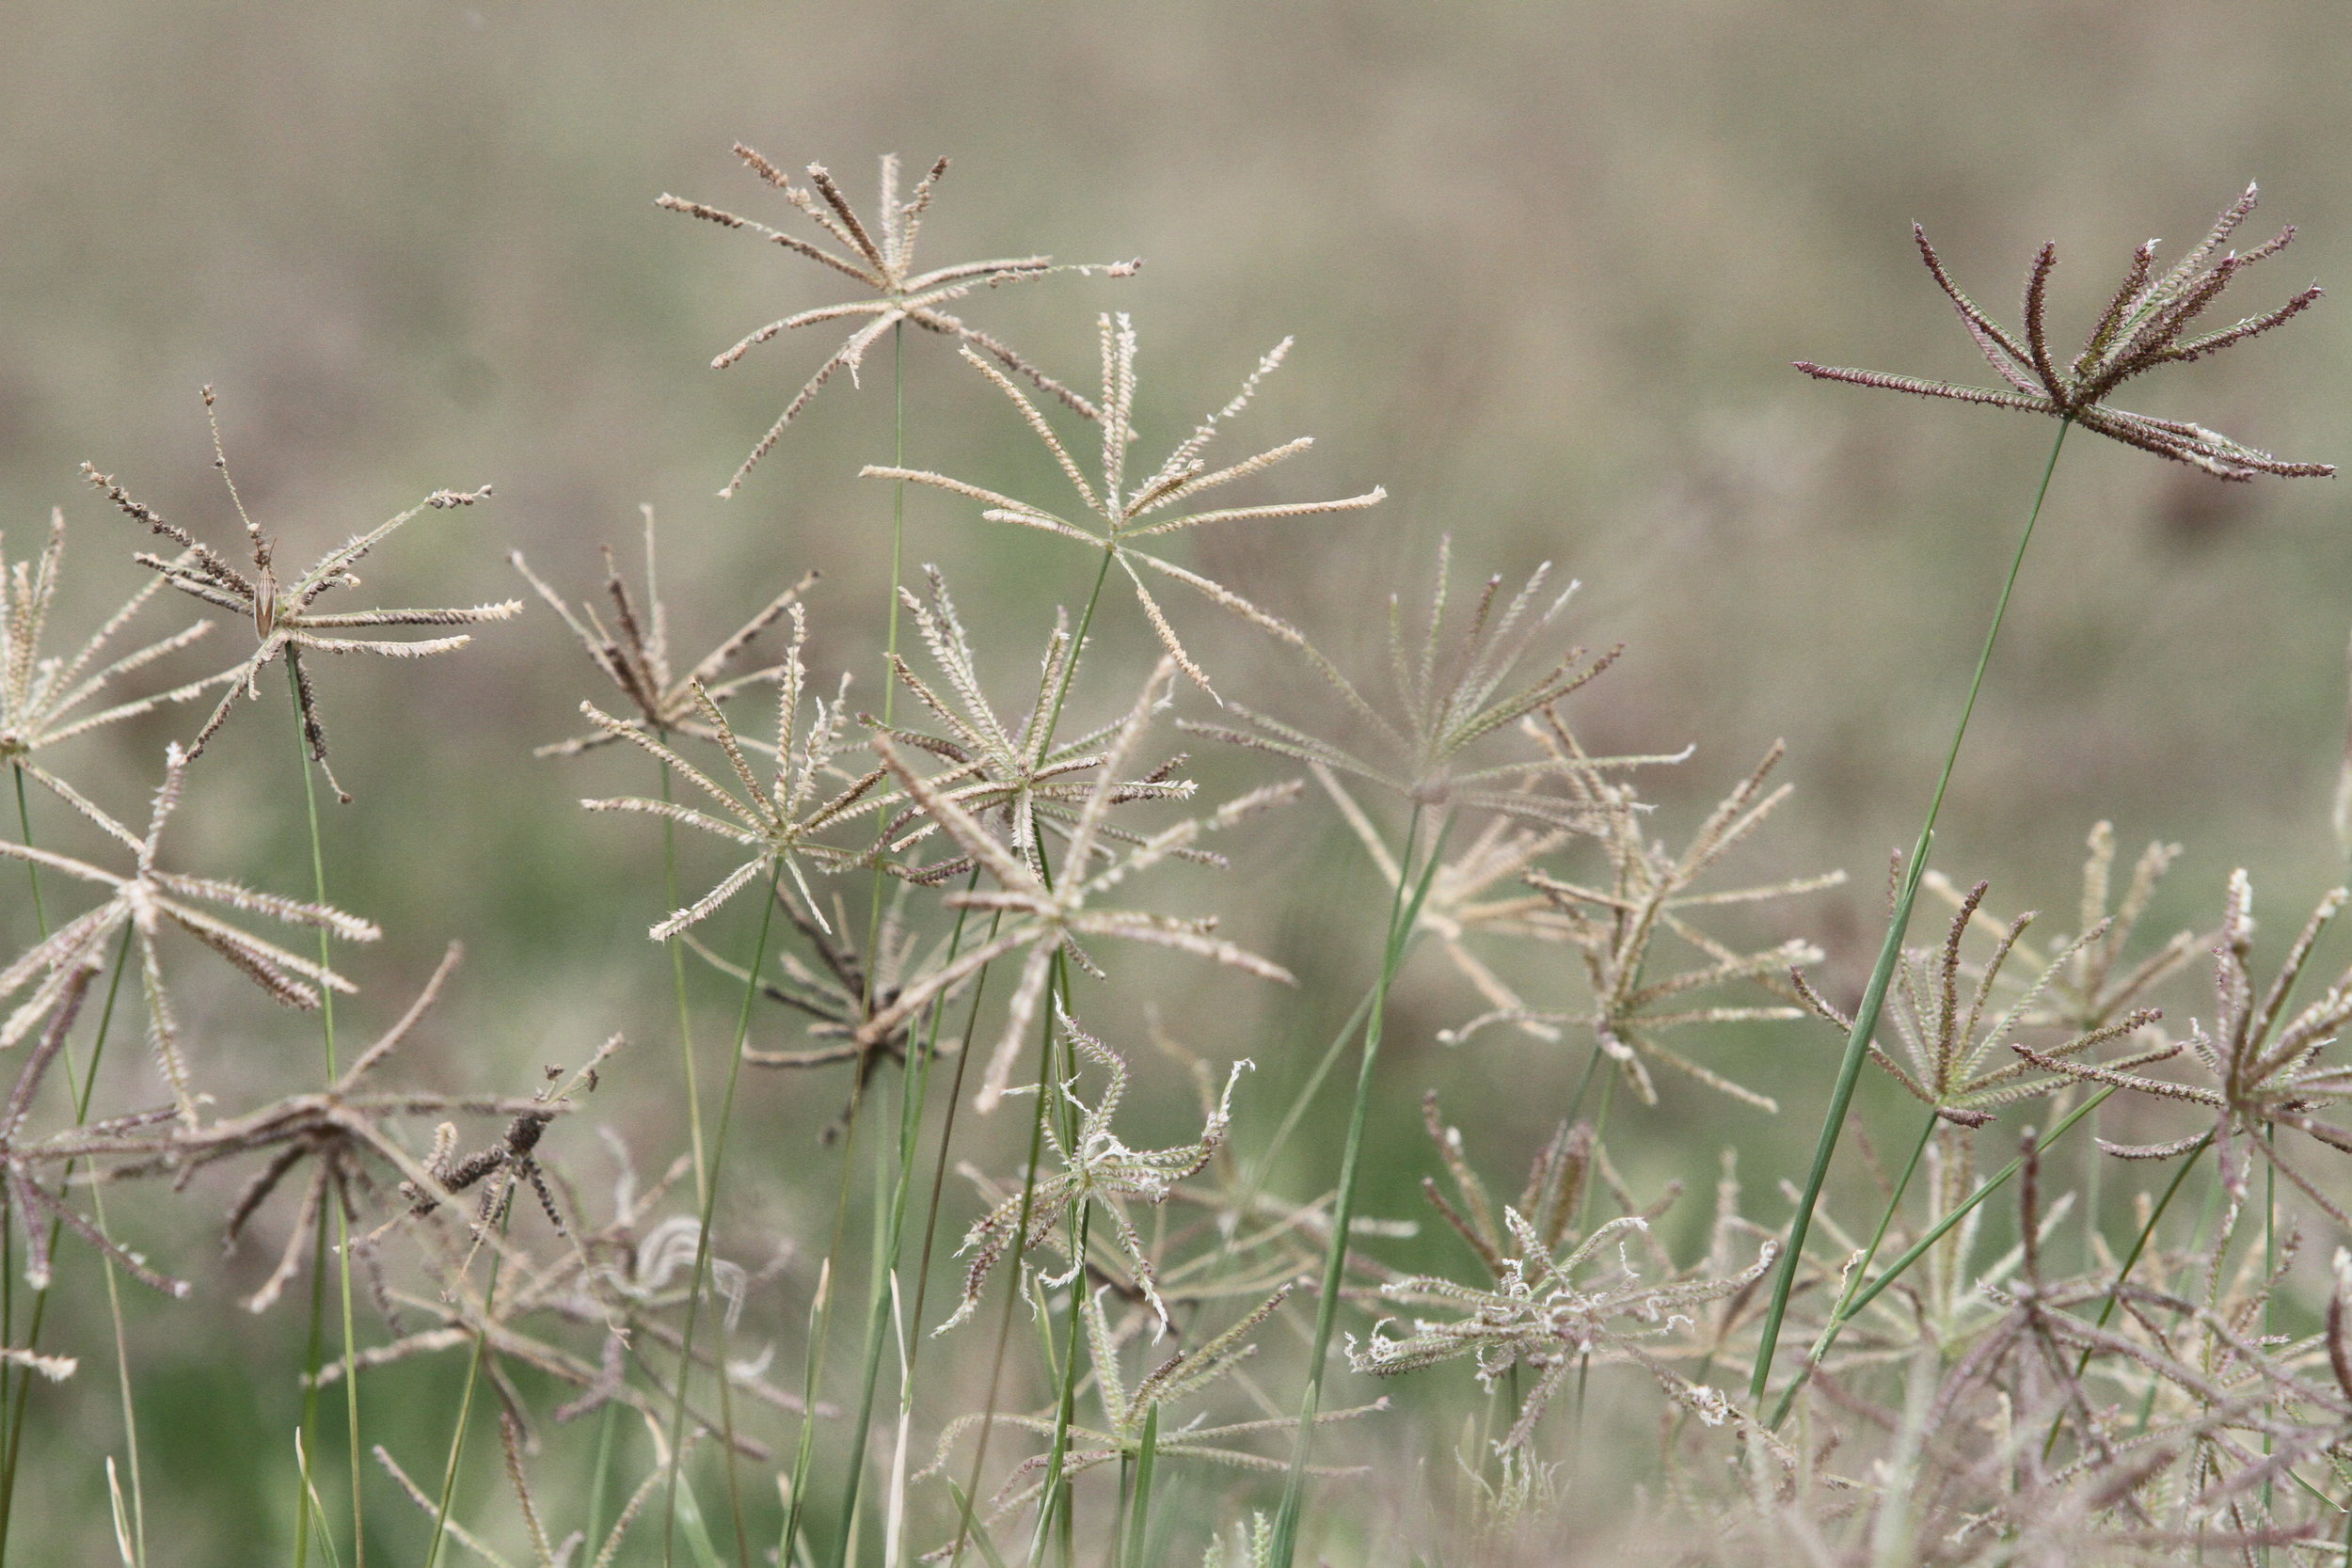 Mariah Hooded Windmillgrass